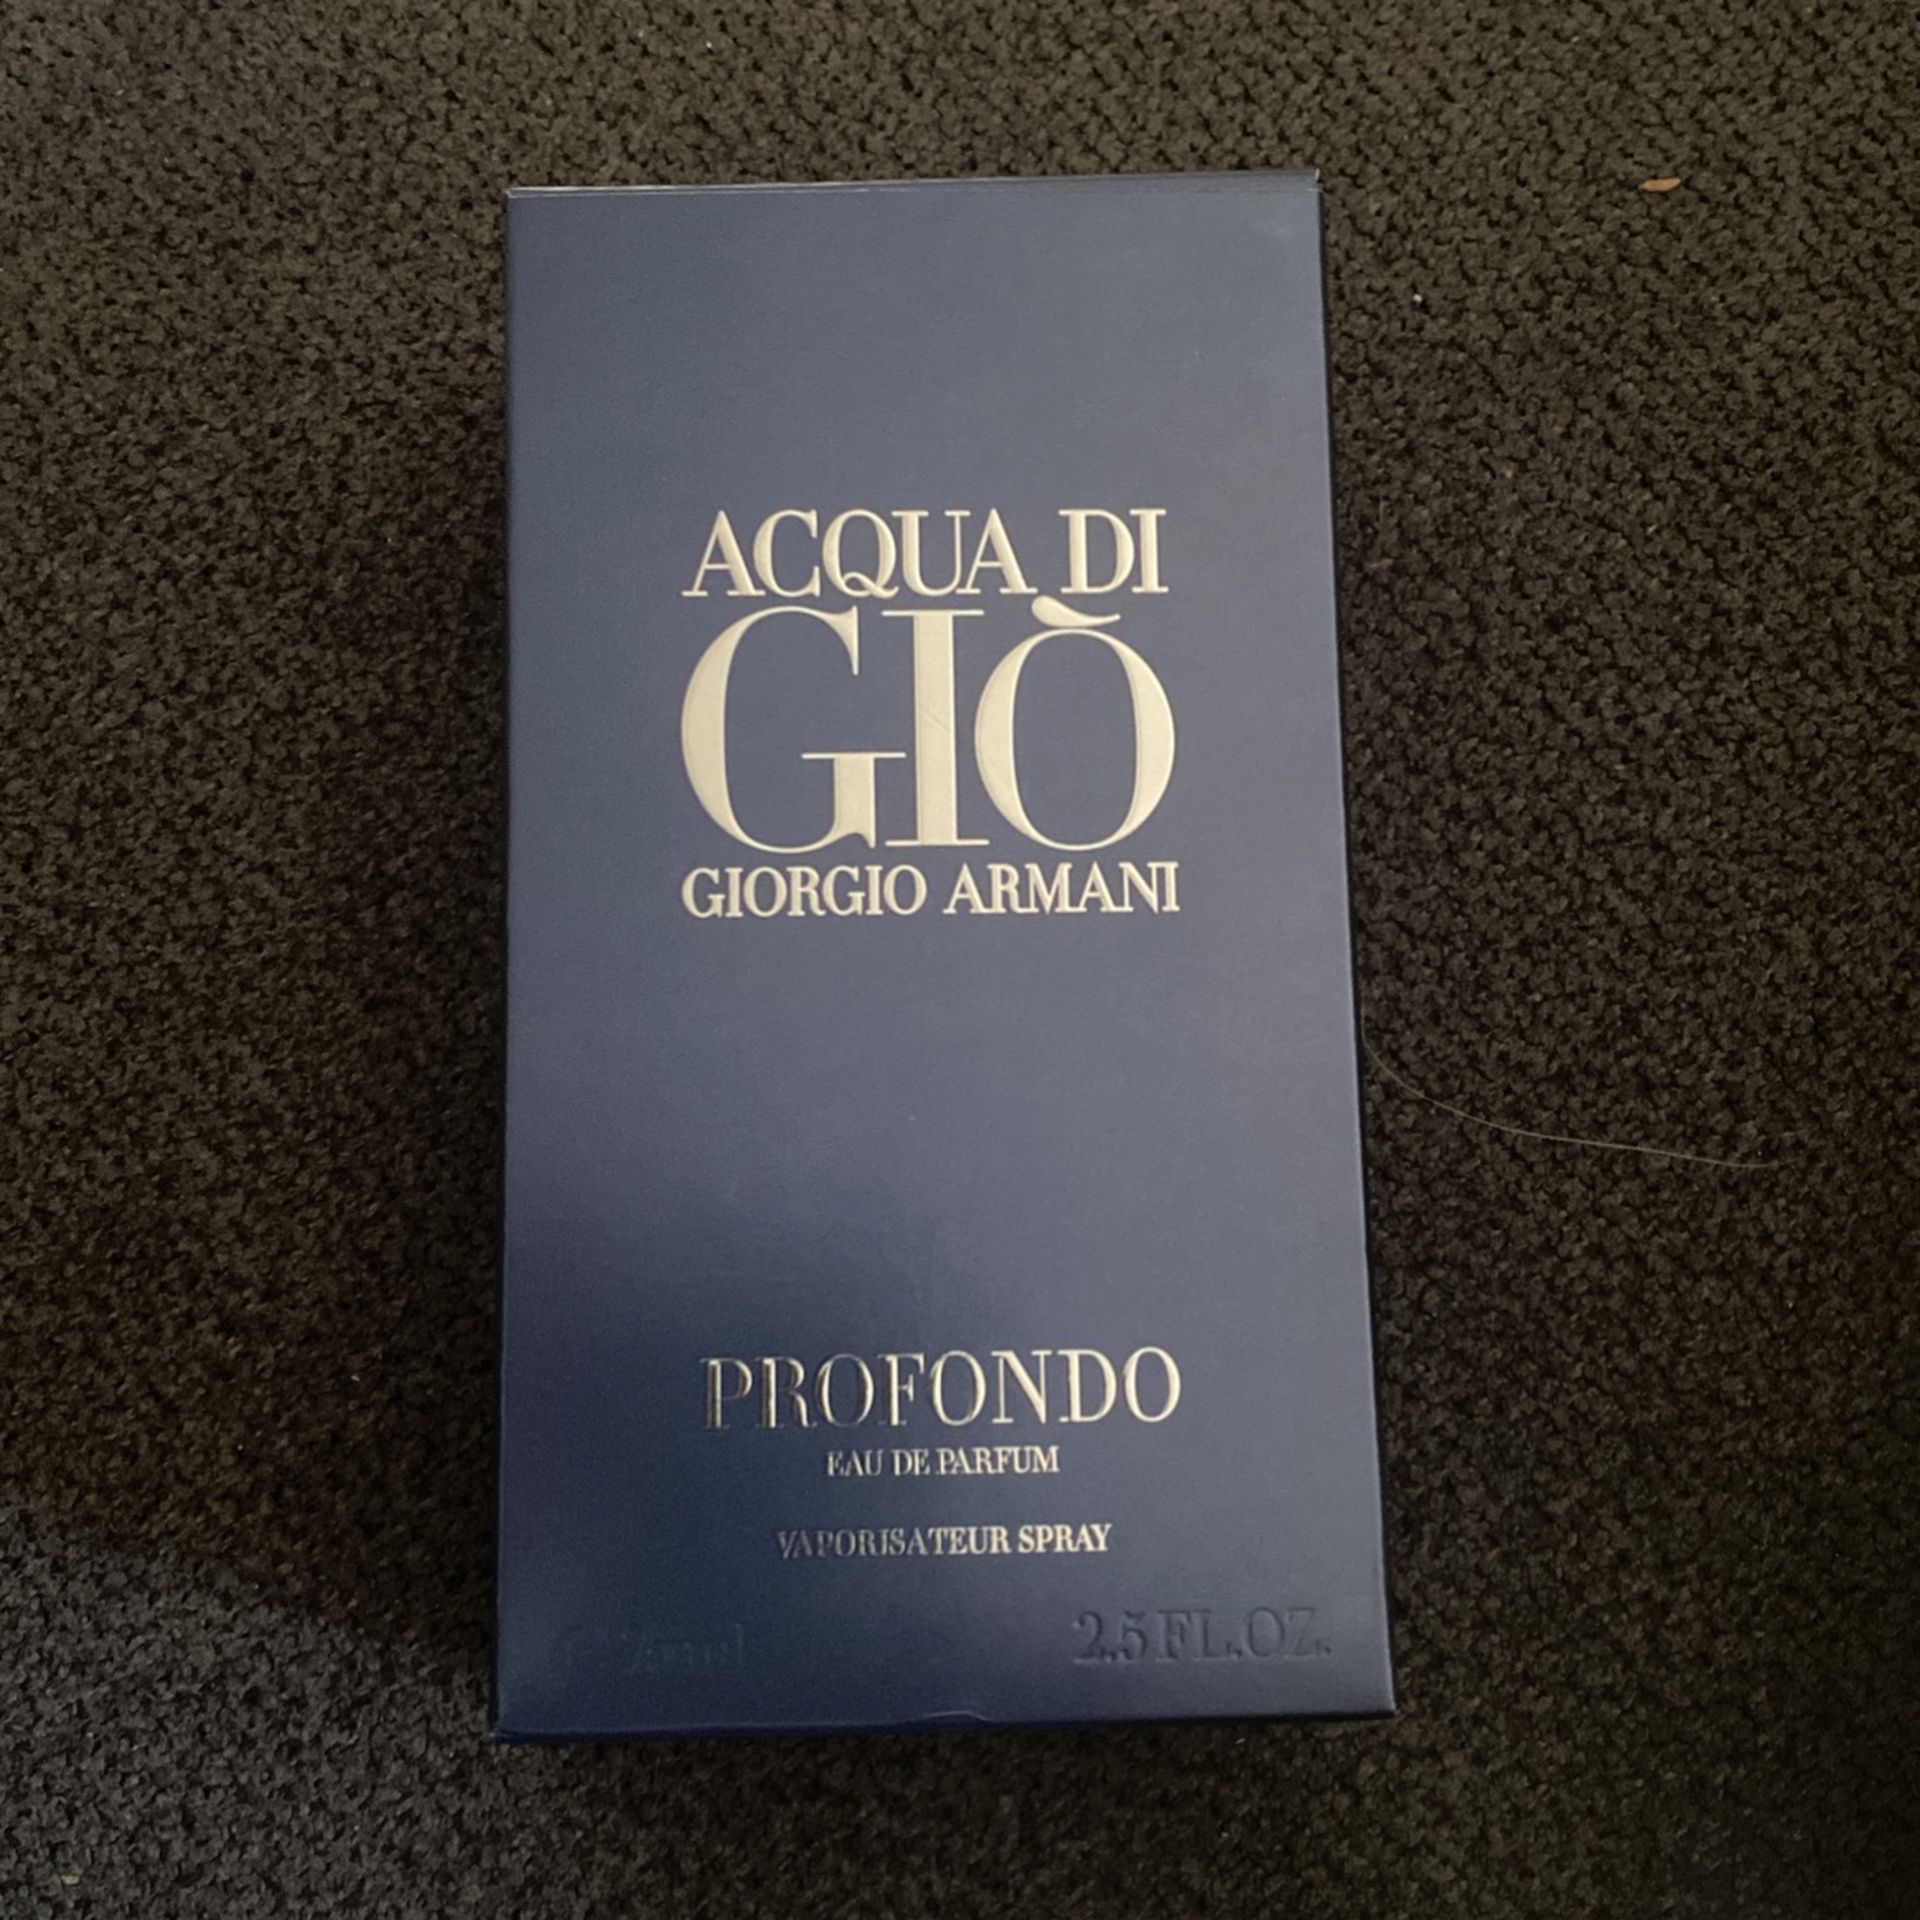 Acquaint Do Gio Giorgio Armani